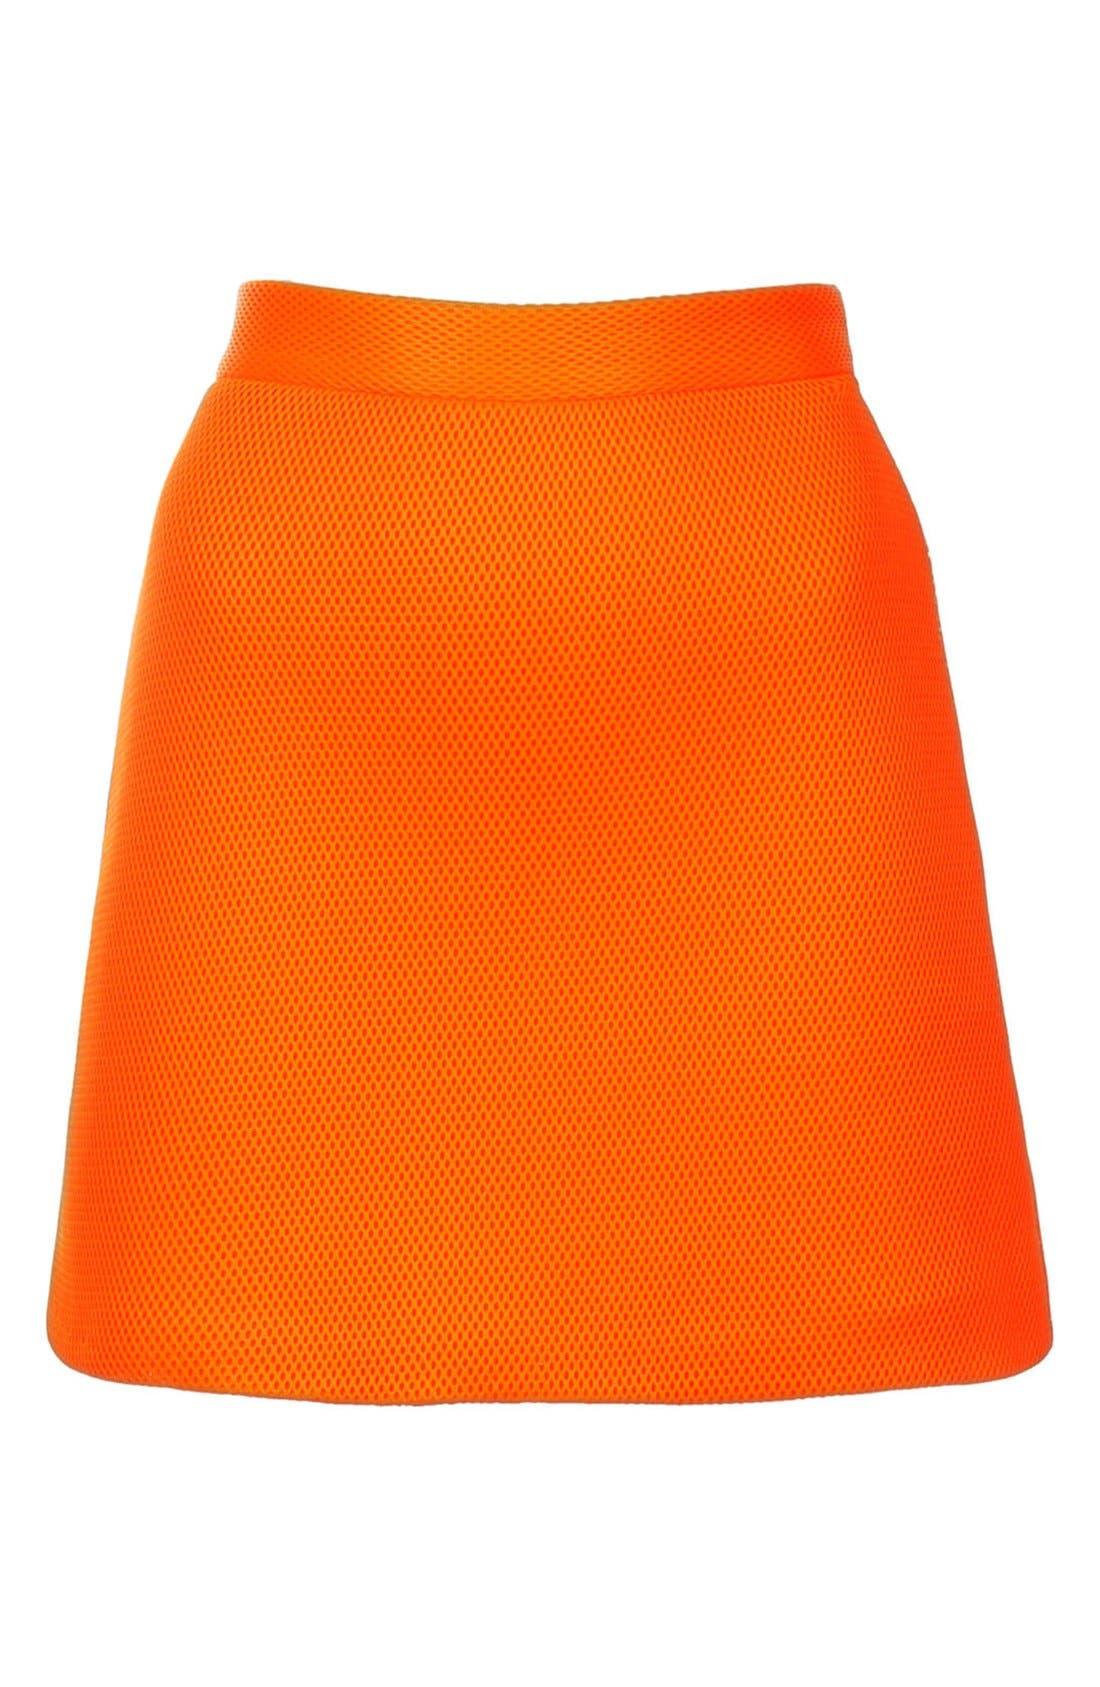 Airtex Miniskirt,                             Alternate thumbnail 8, color,